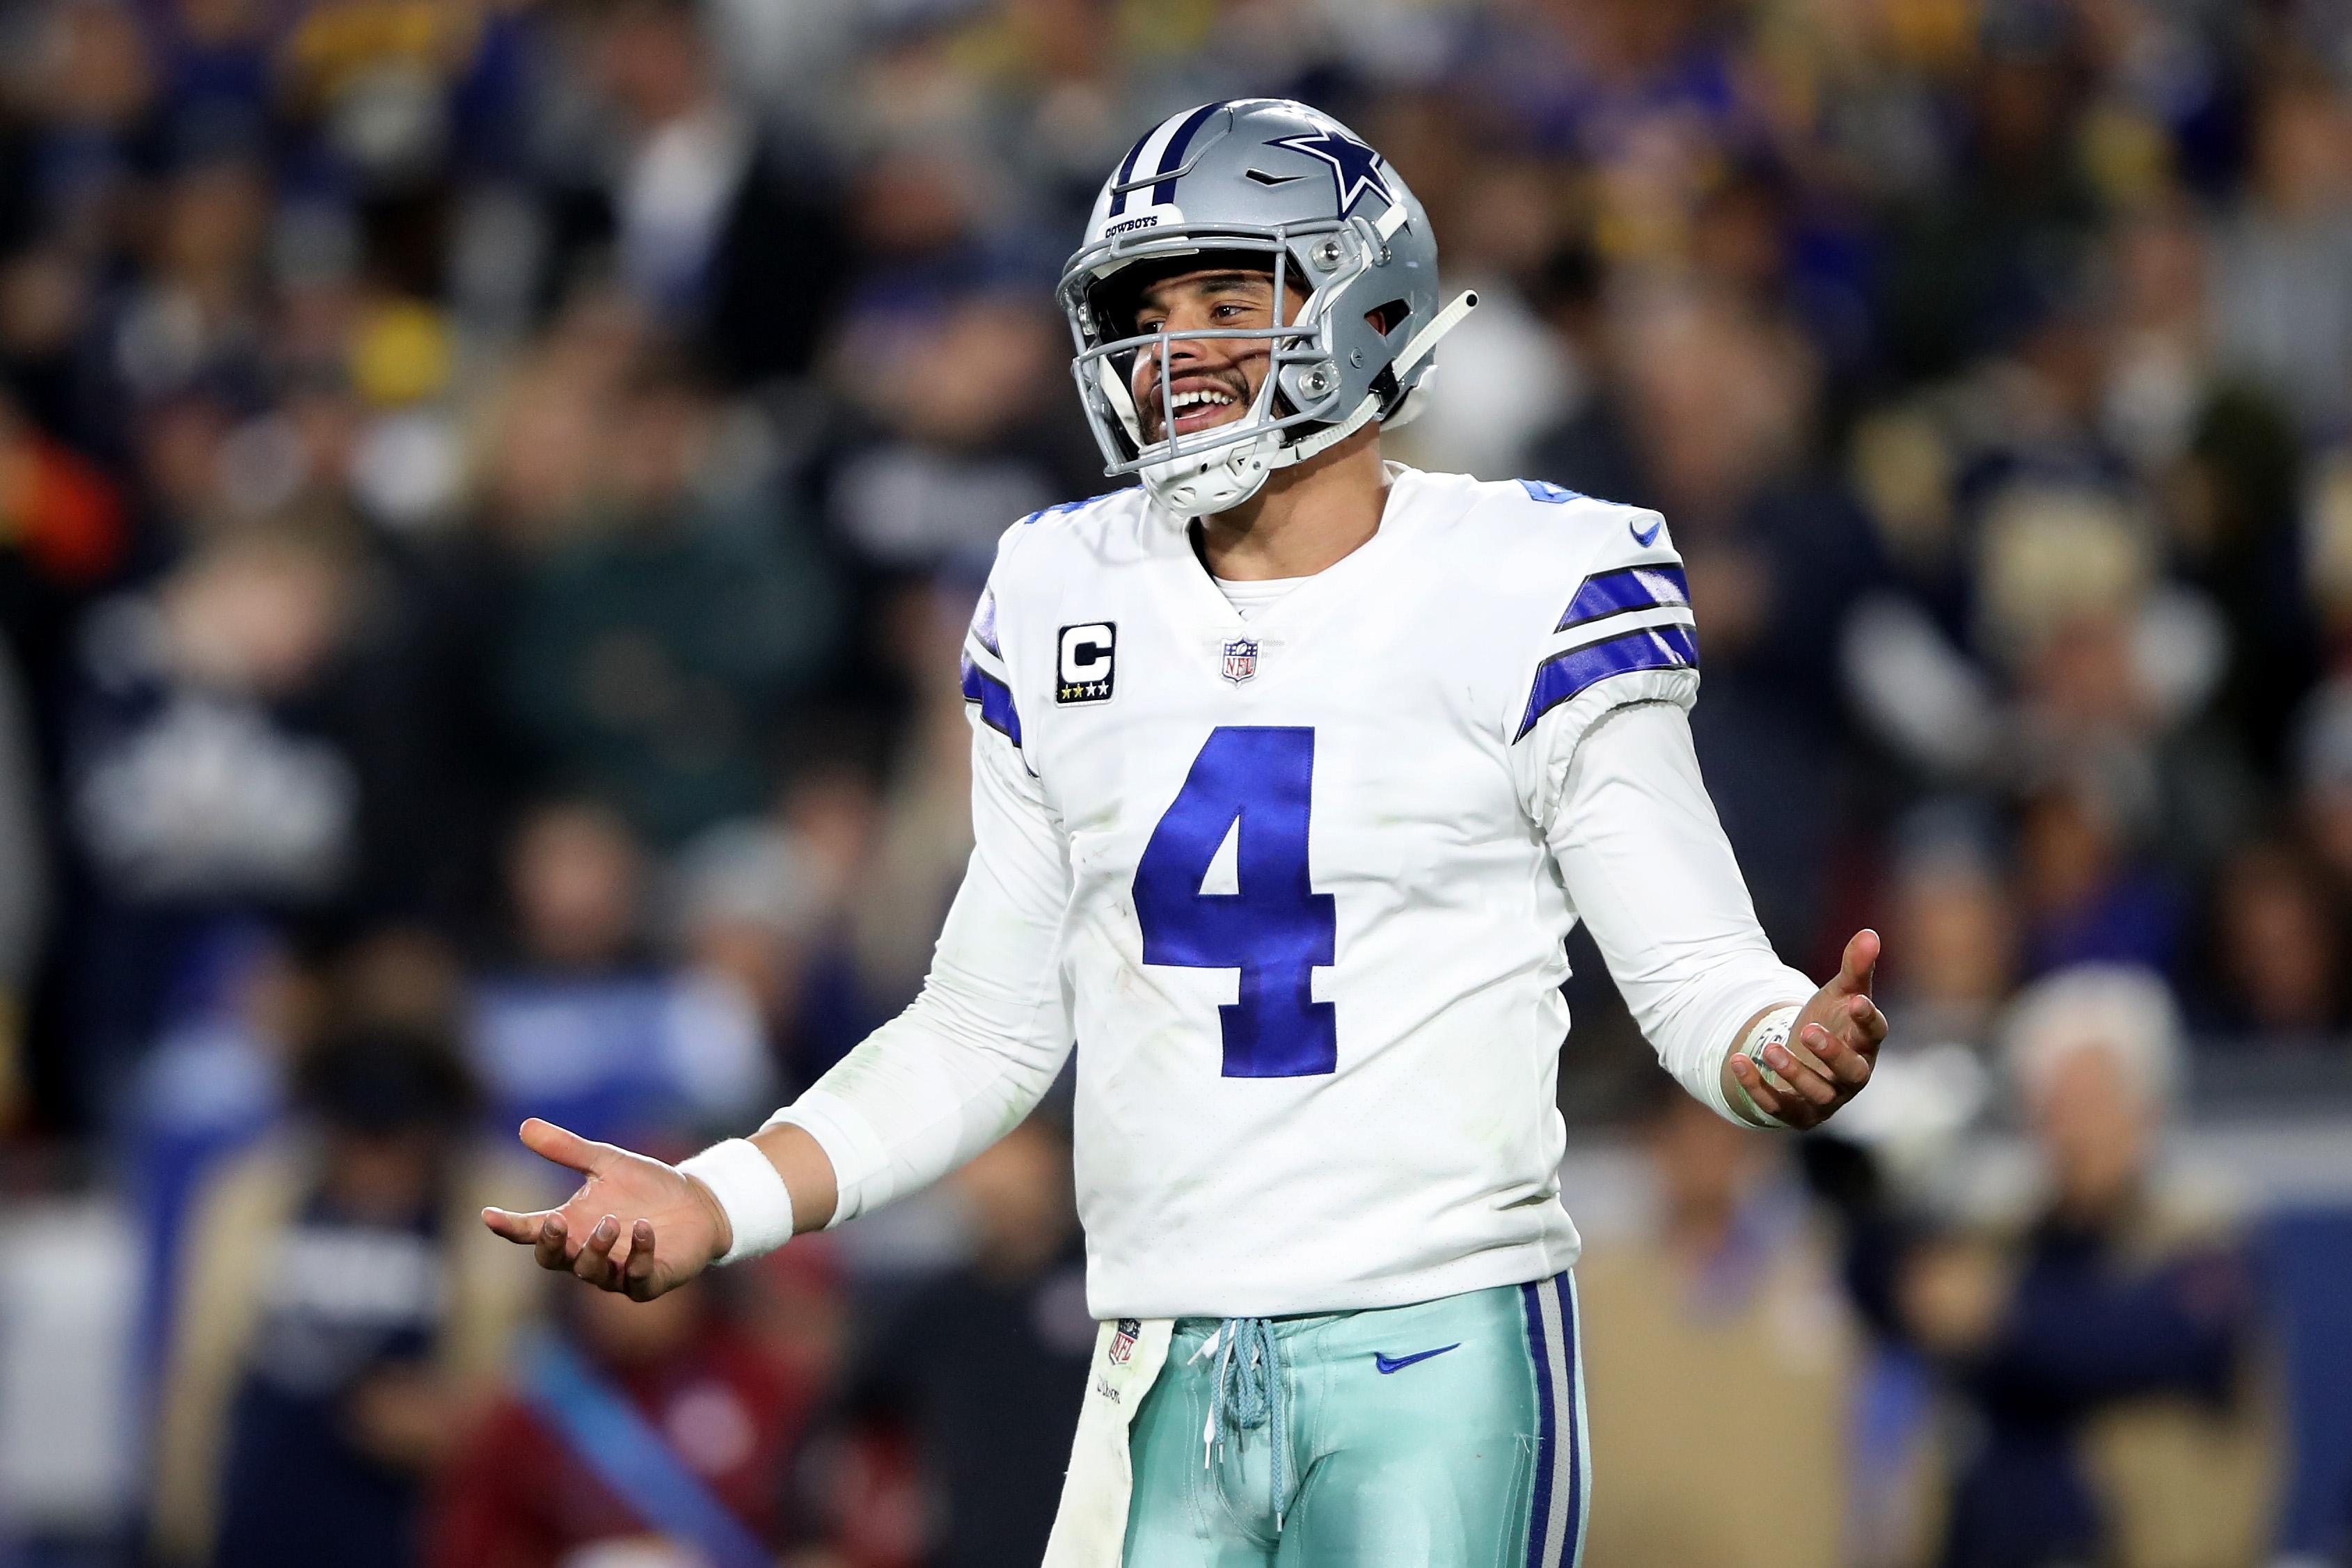 Dak Prescott gestures during a Cowboys playoff game